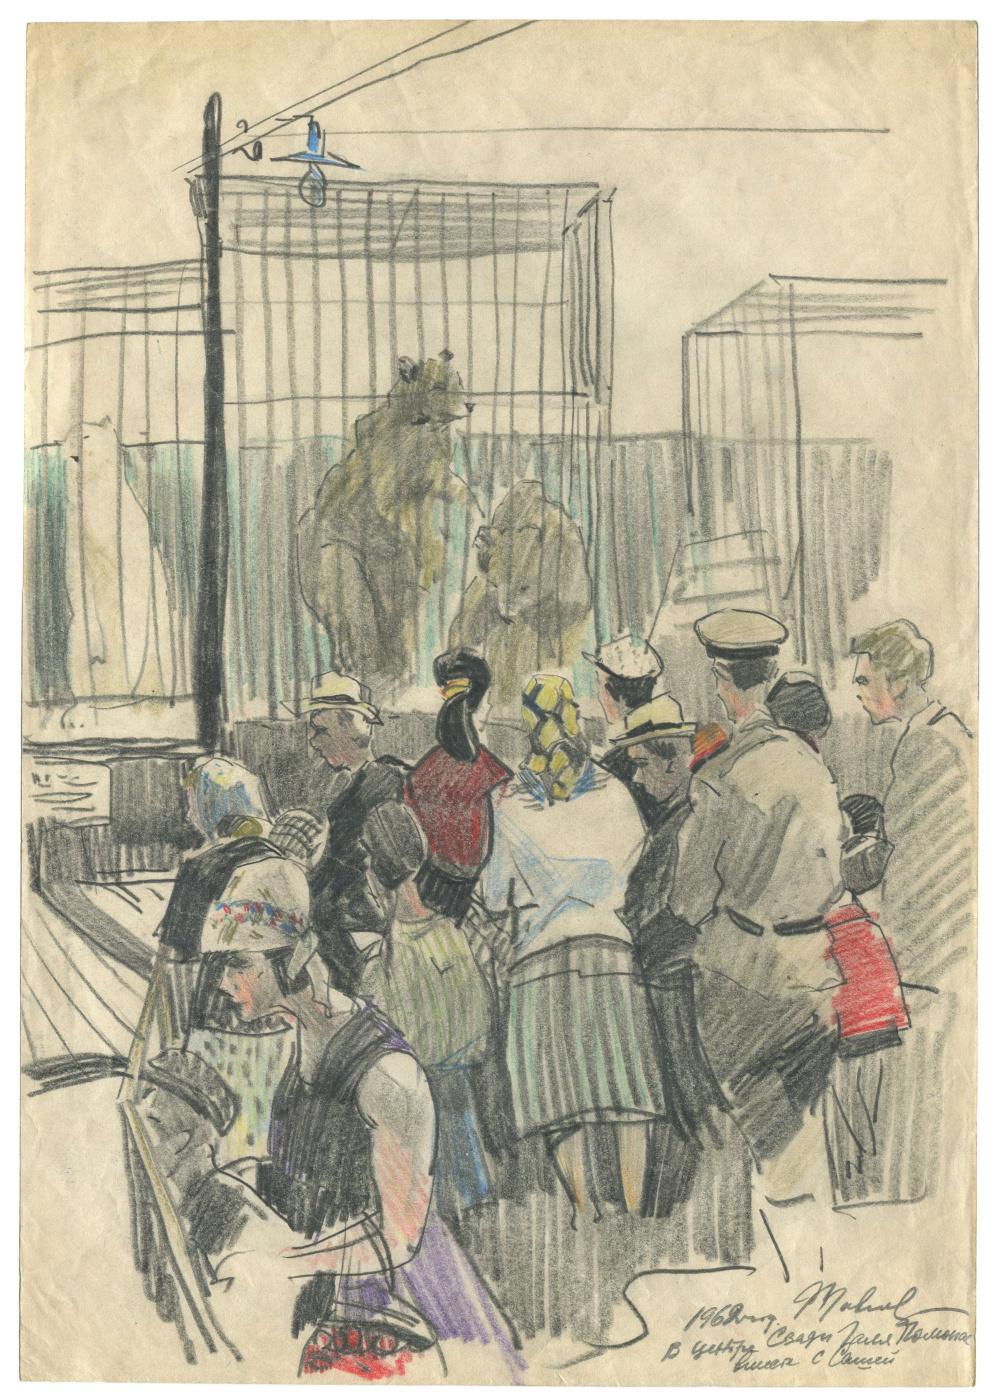 Alexandrovich Rudolf Pavlov. Sketch in the zoo. Color pencils on paper. Chelyabinsk. 1962